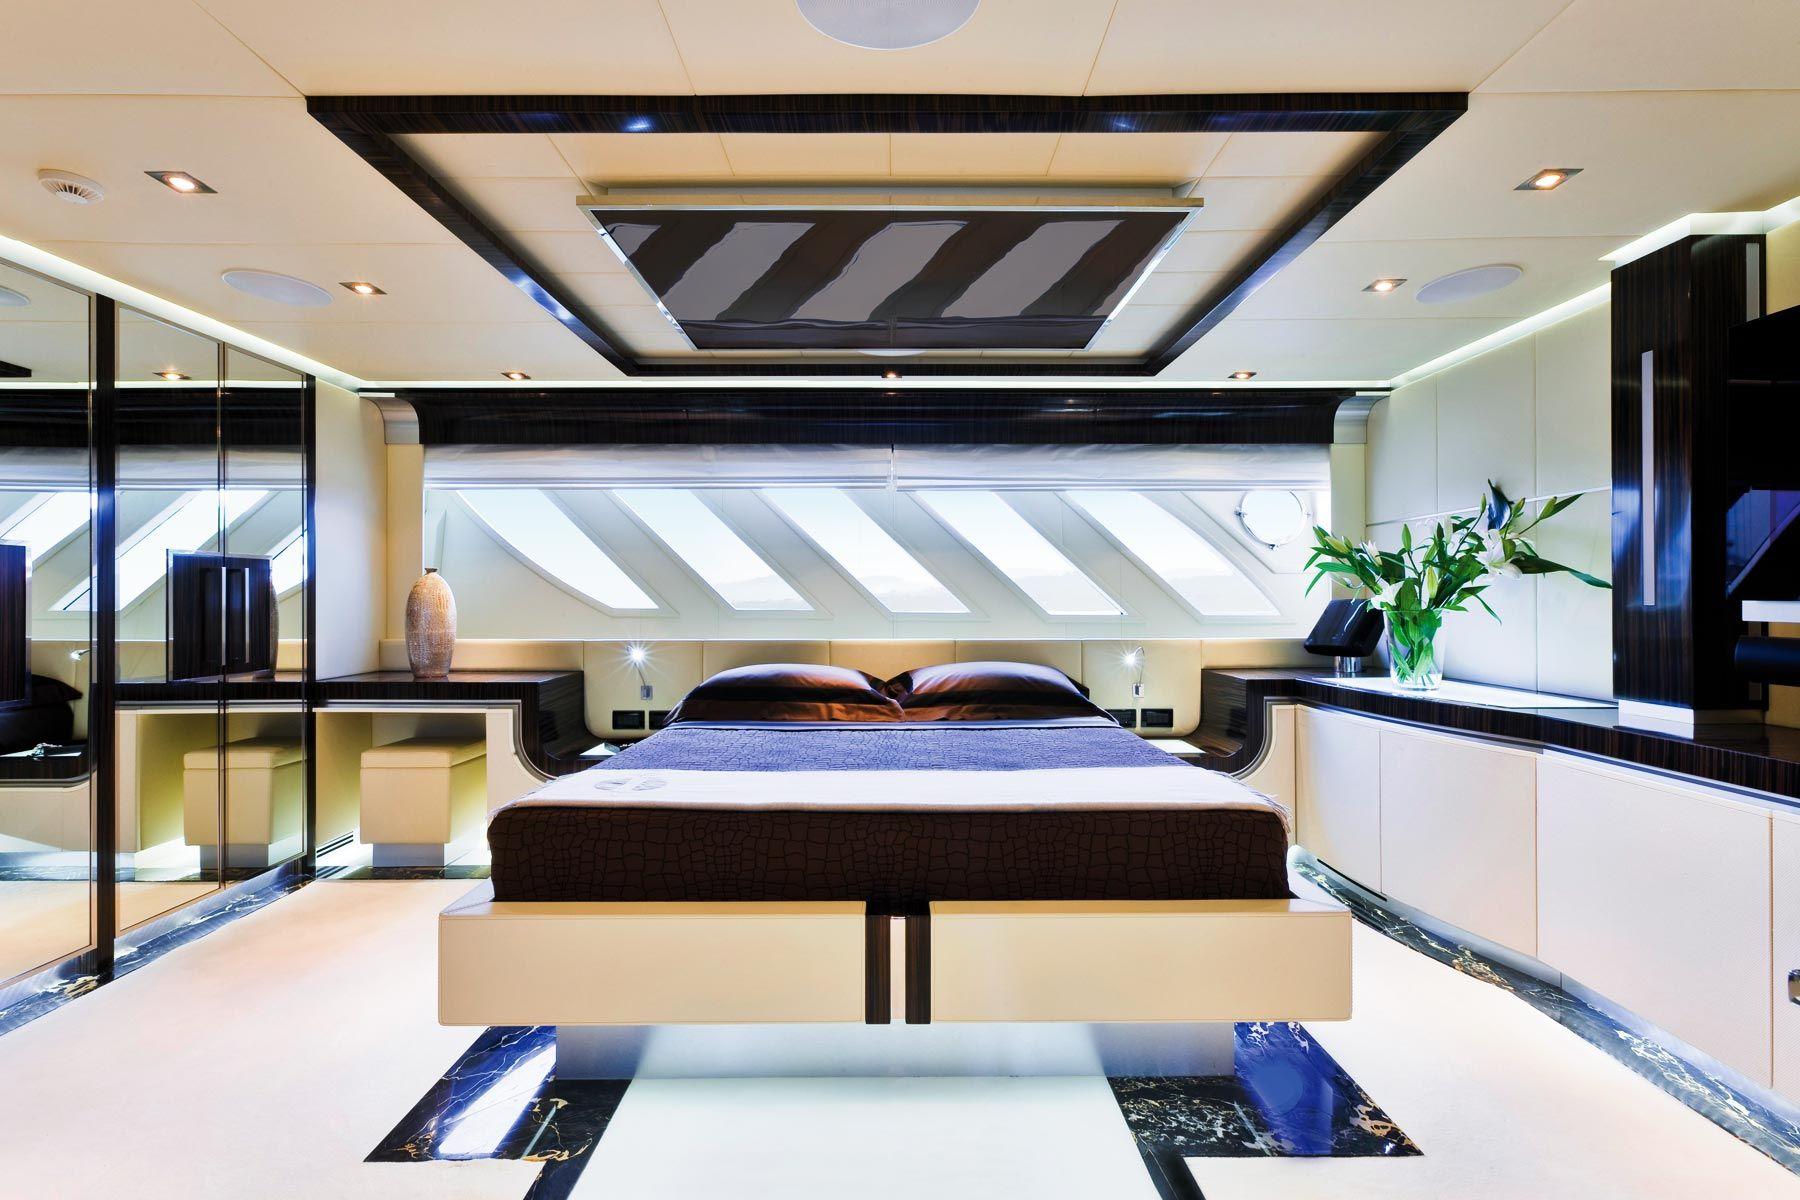 Dominator - Tailormade Luxury Yachts. | - Design & Engineering | Dominator - Tailormade Luxury Yachts.